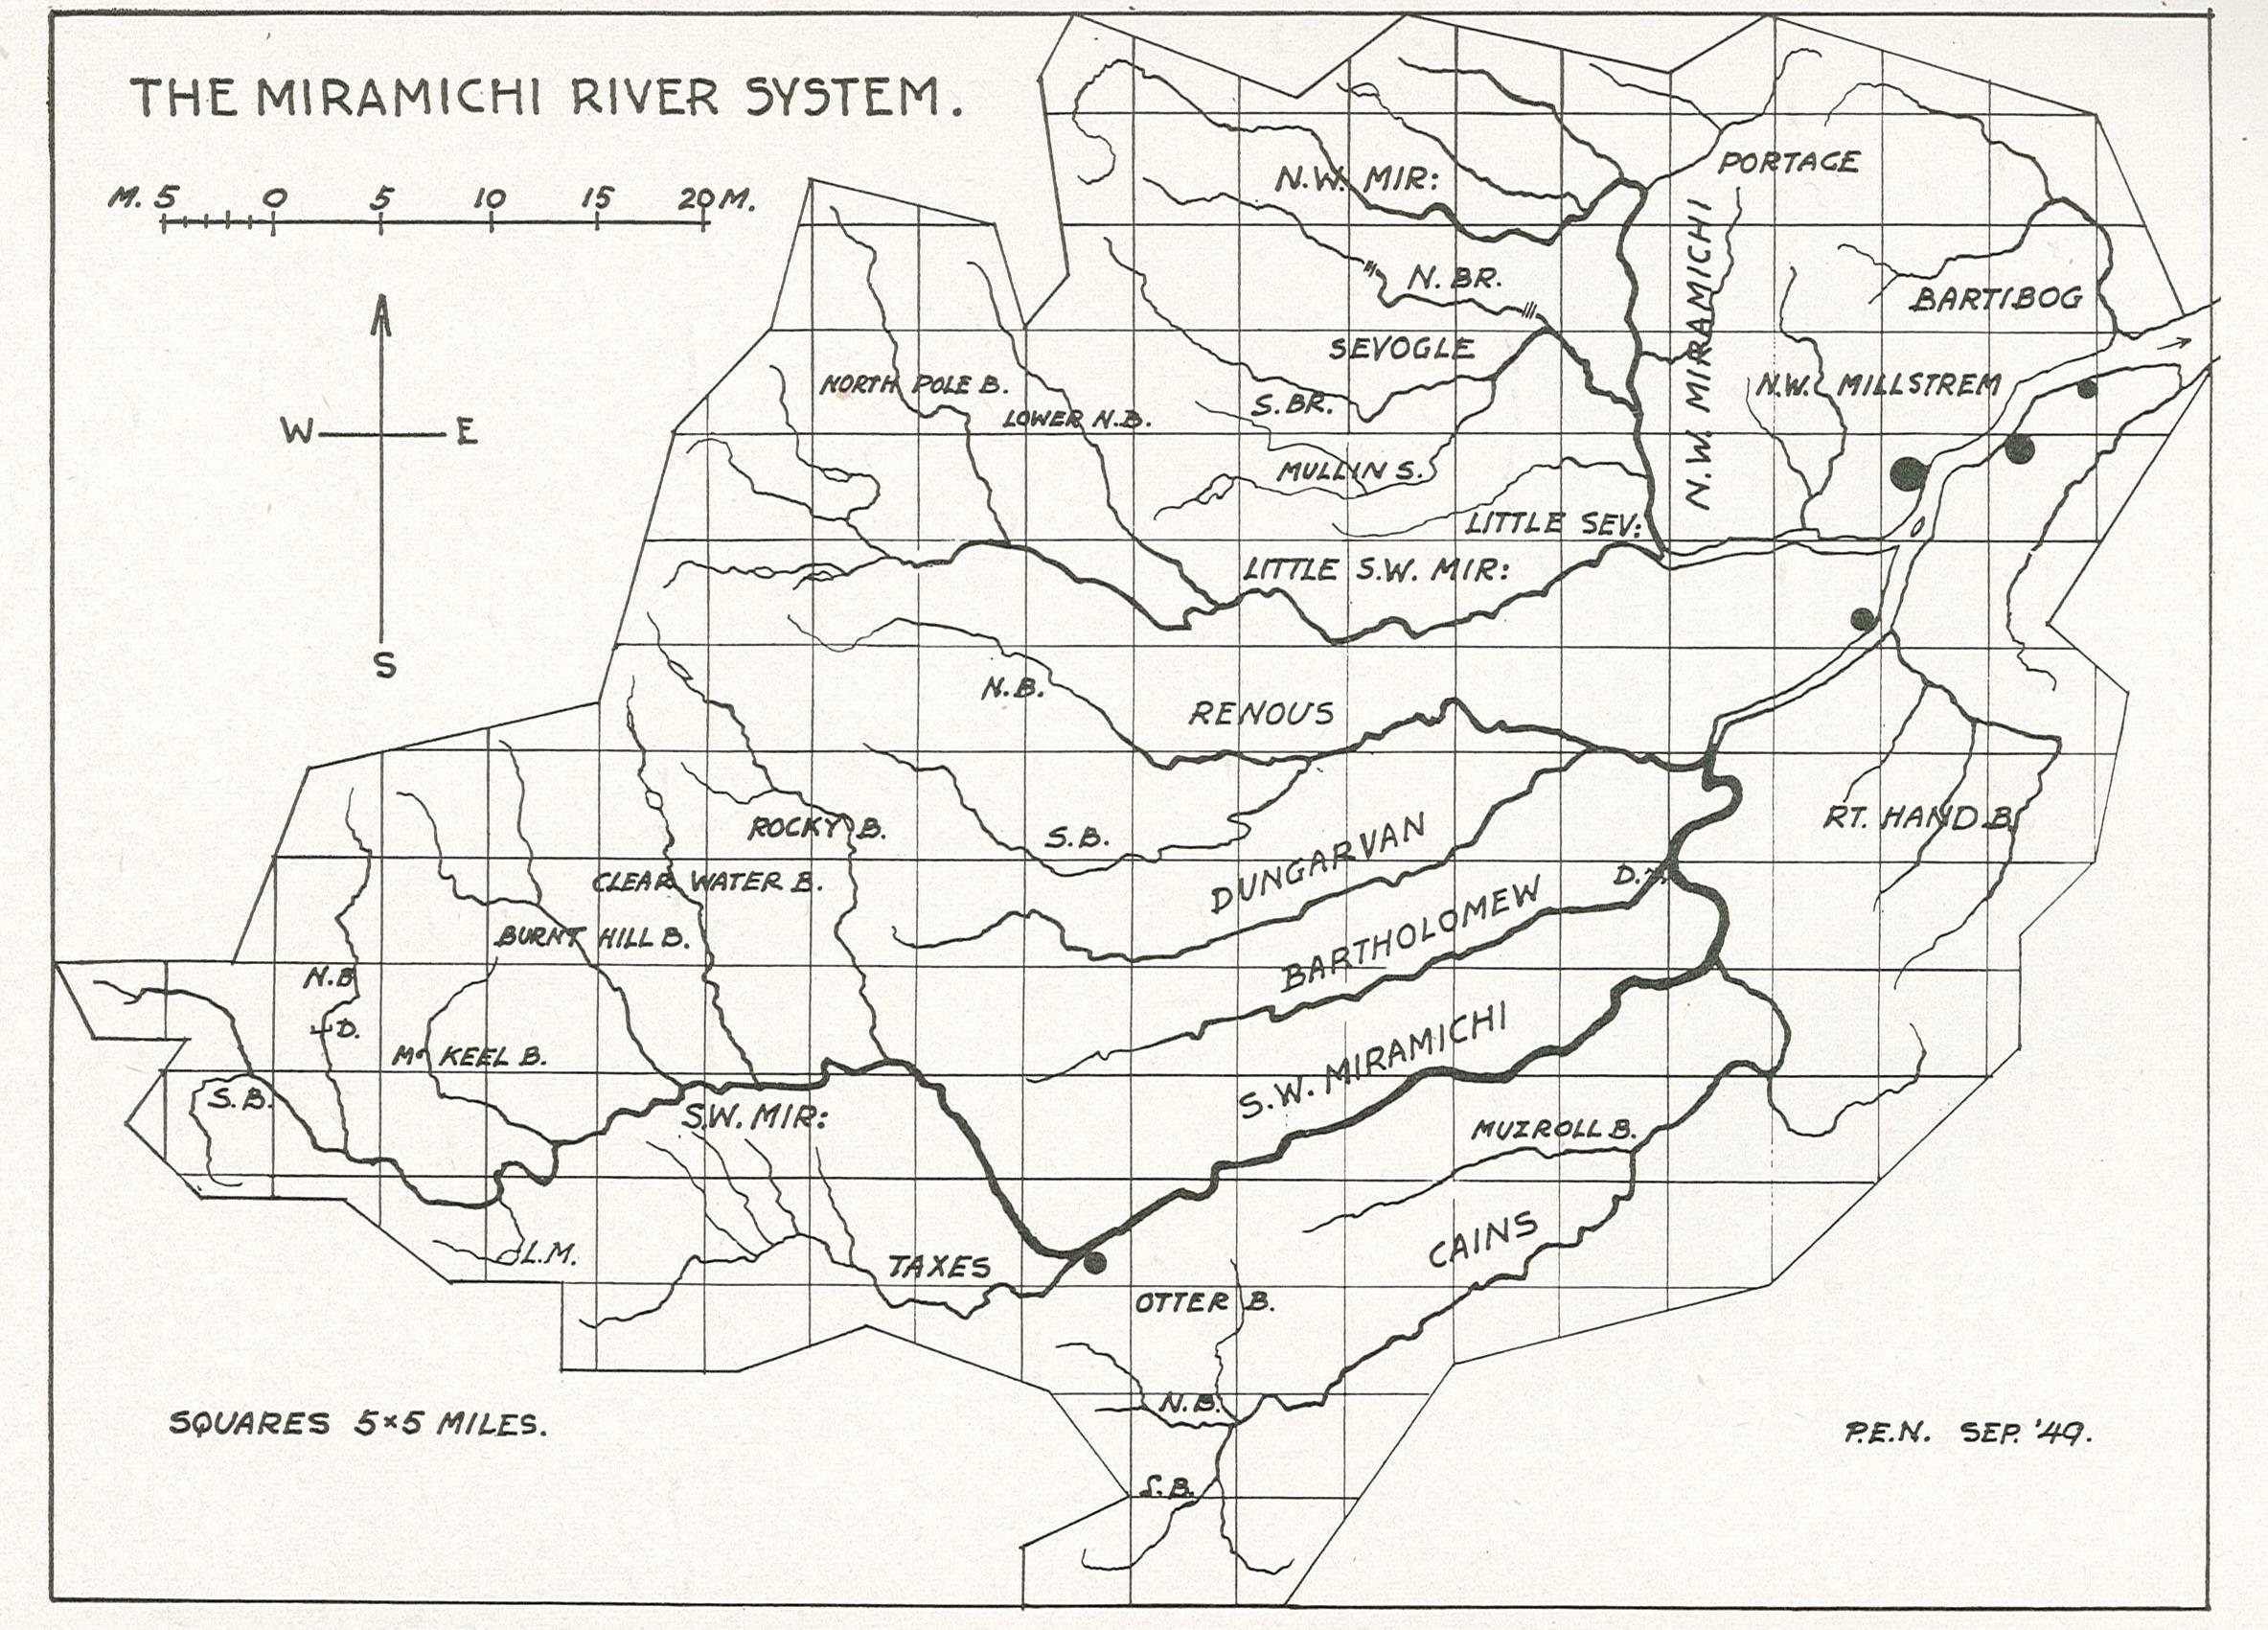 1 nobb's map